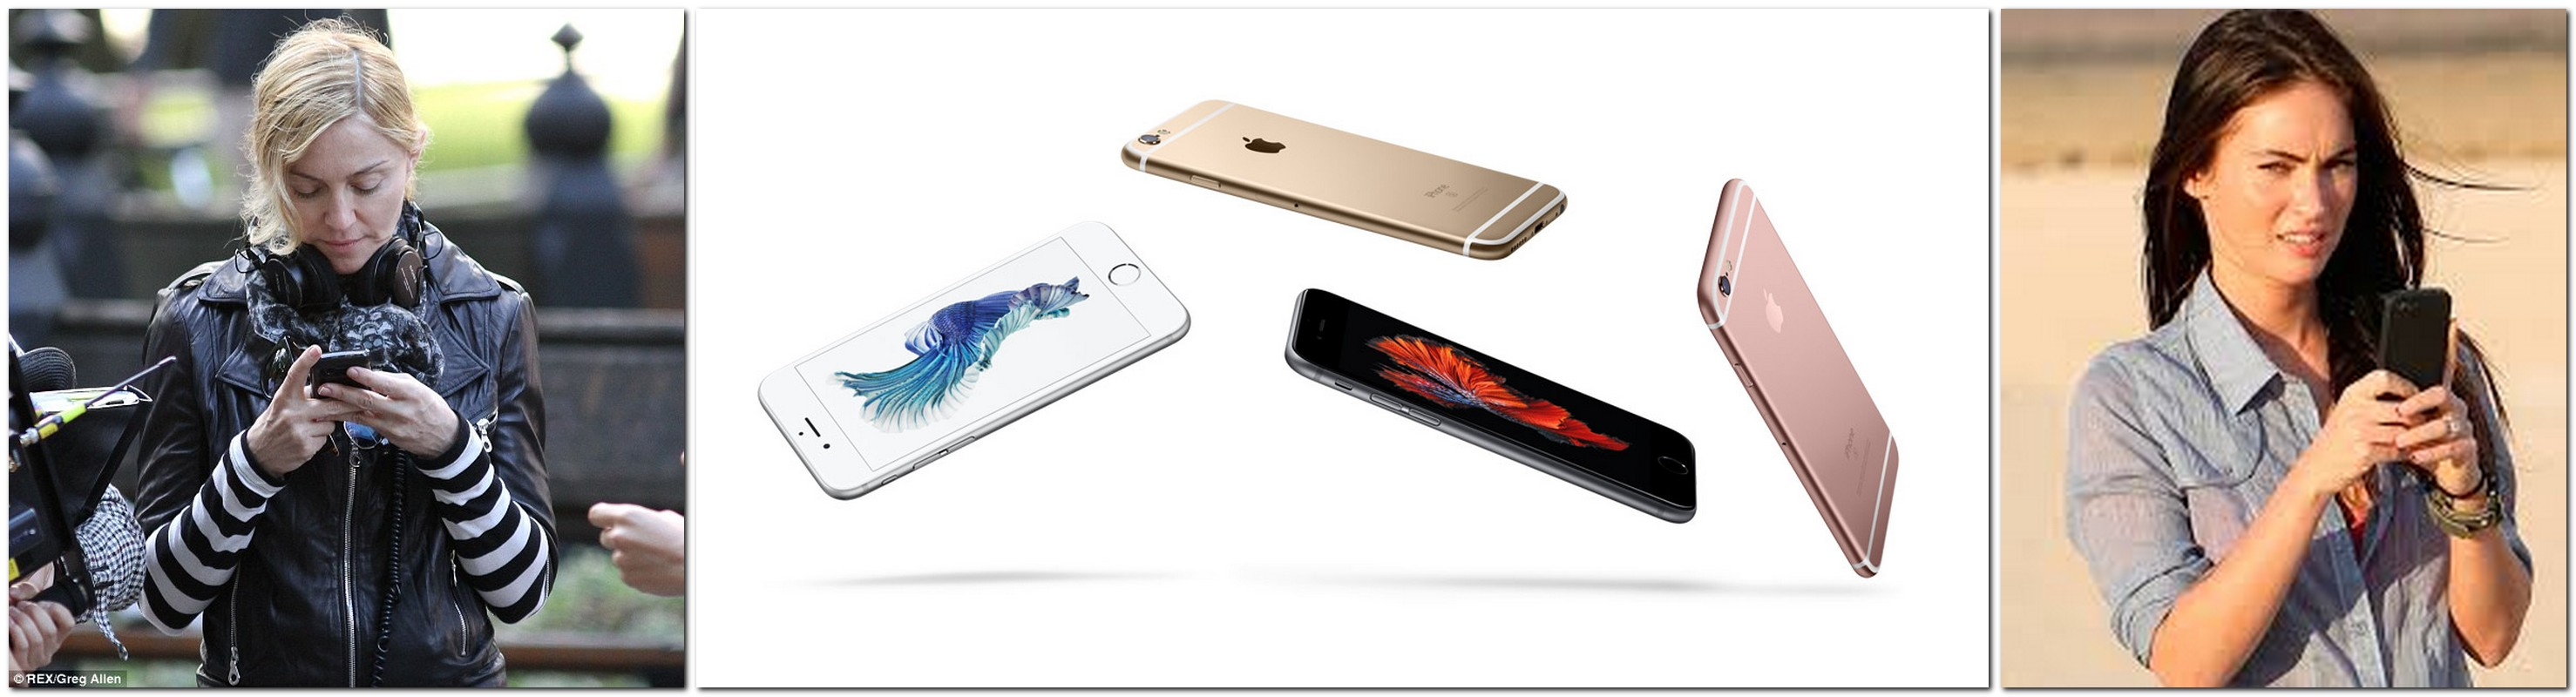 brands-cell-phones-popular-among-celebrities